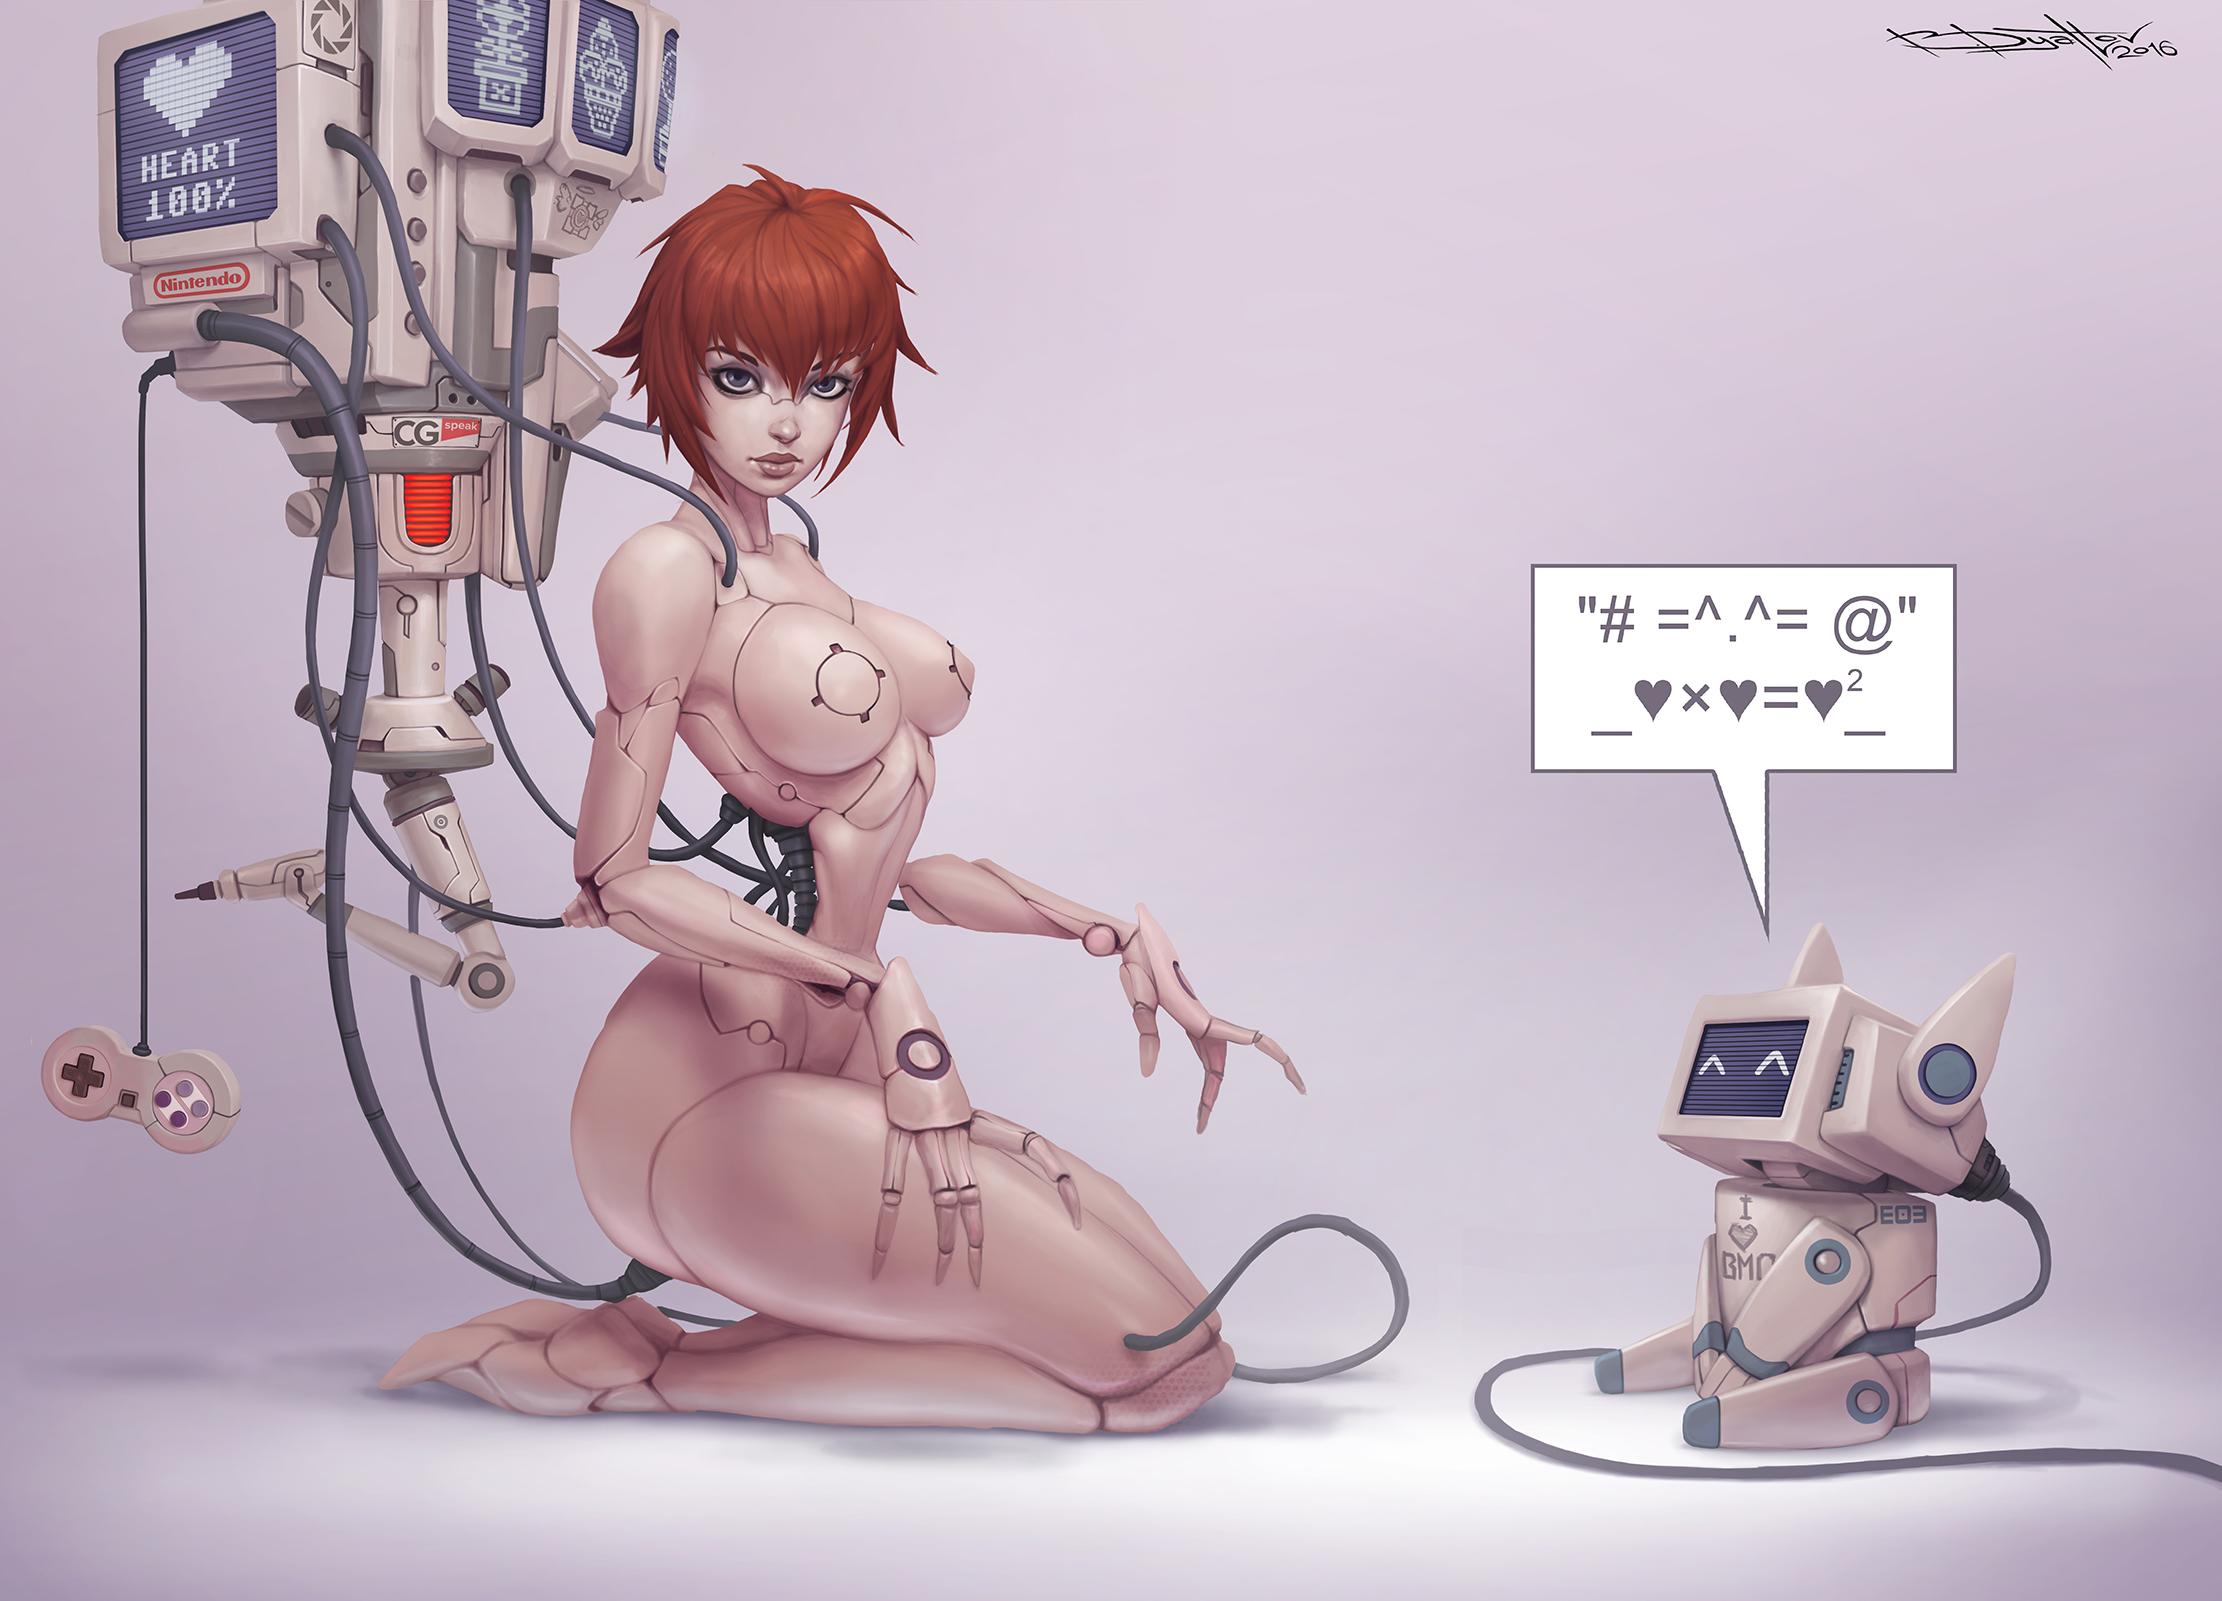 some droids